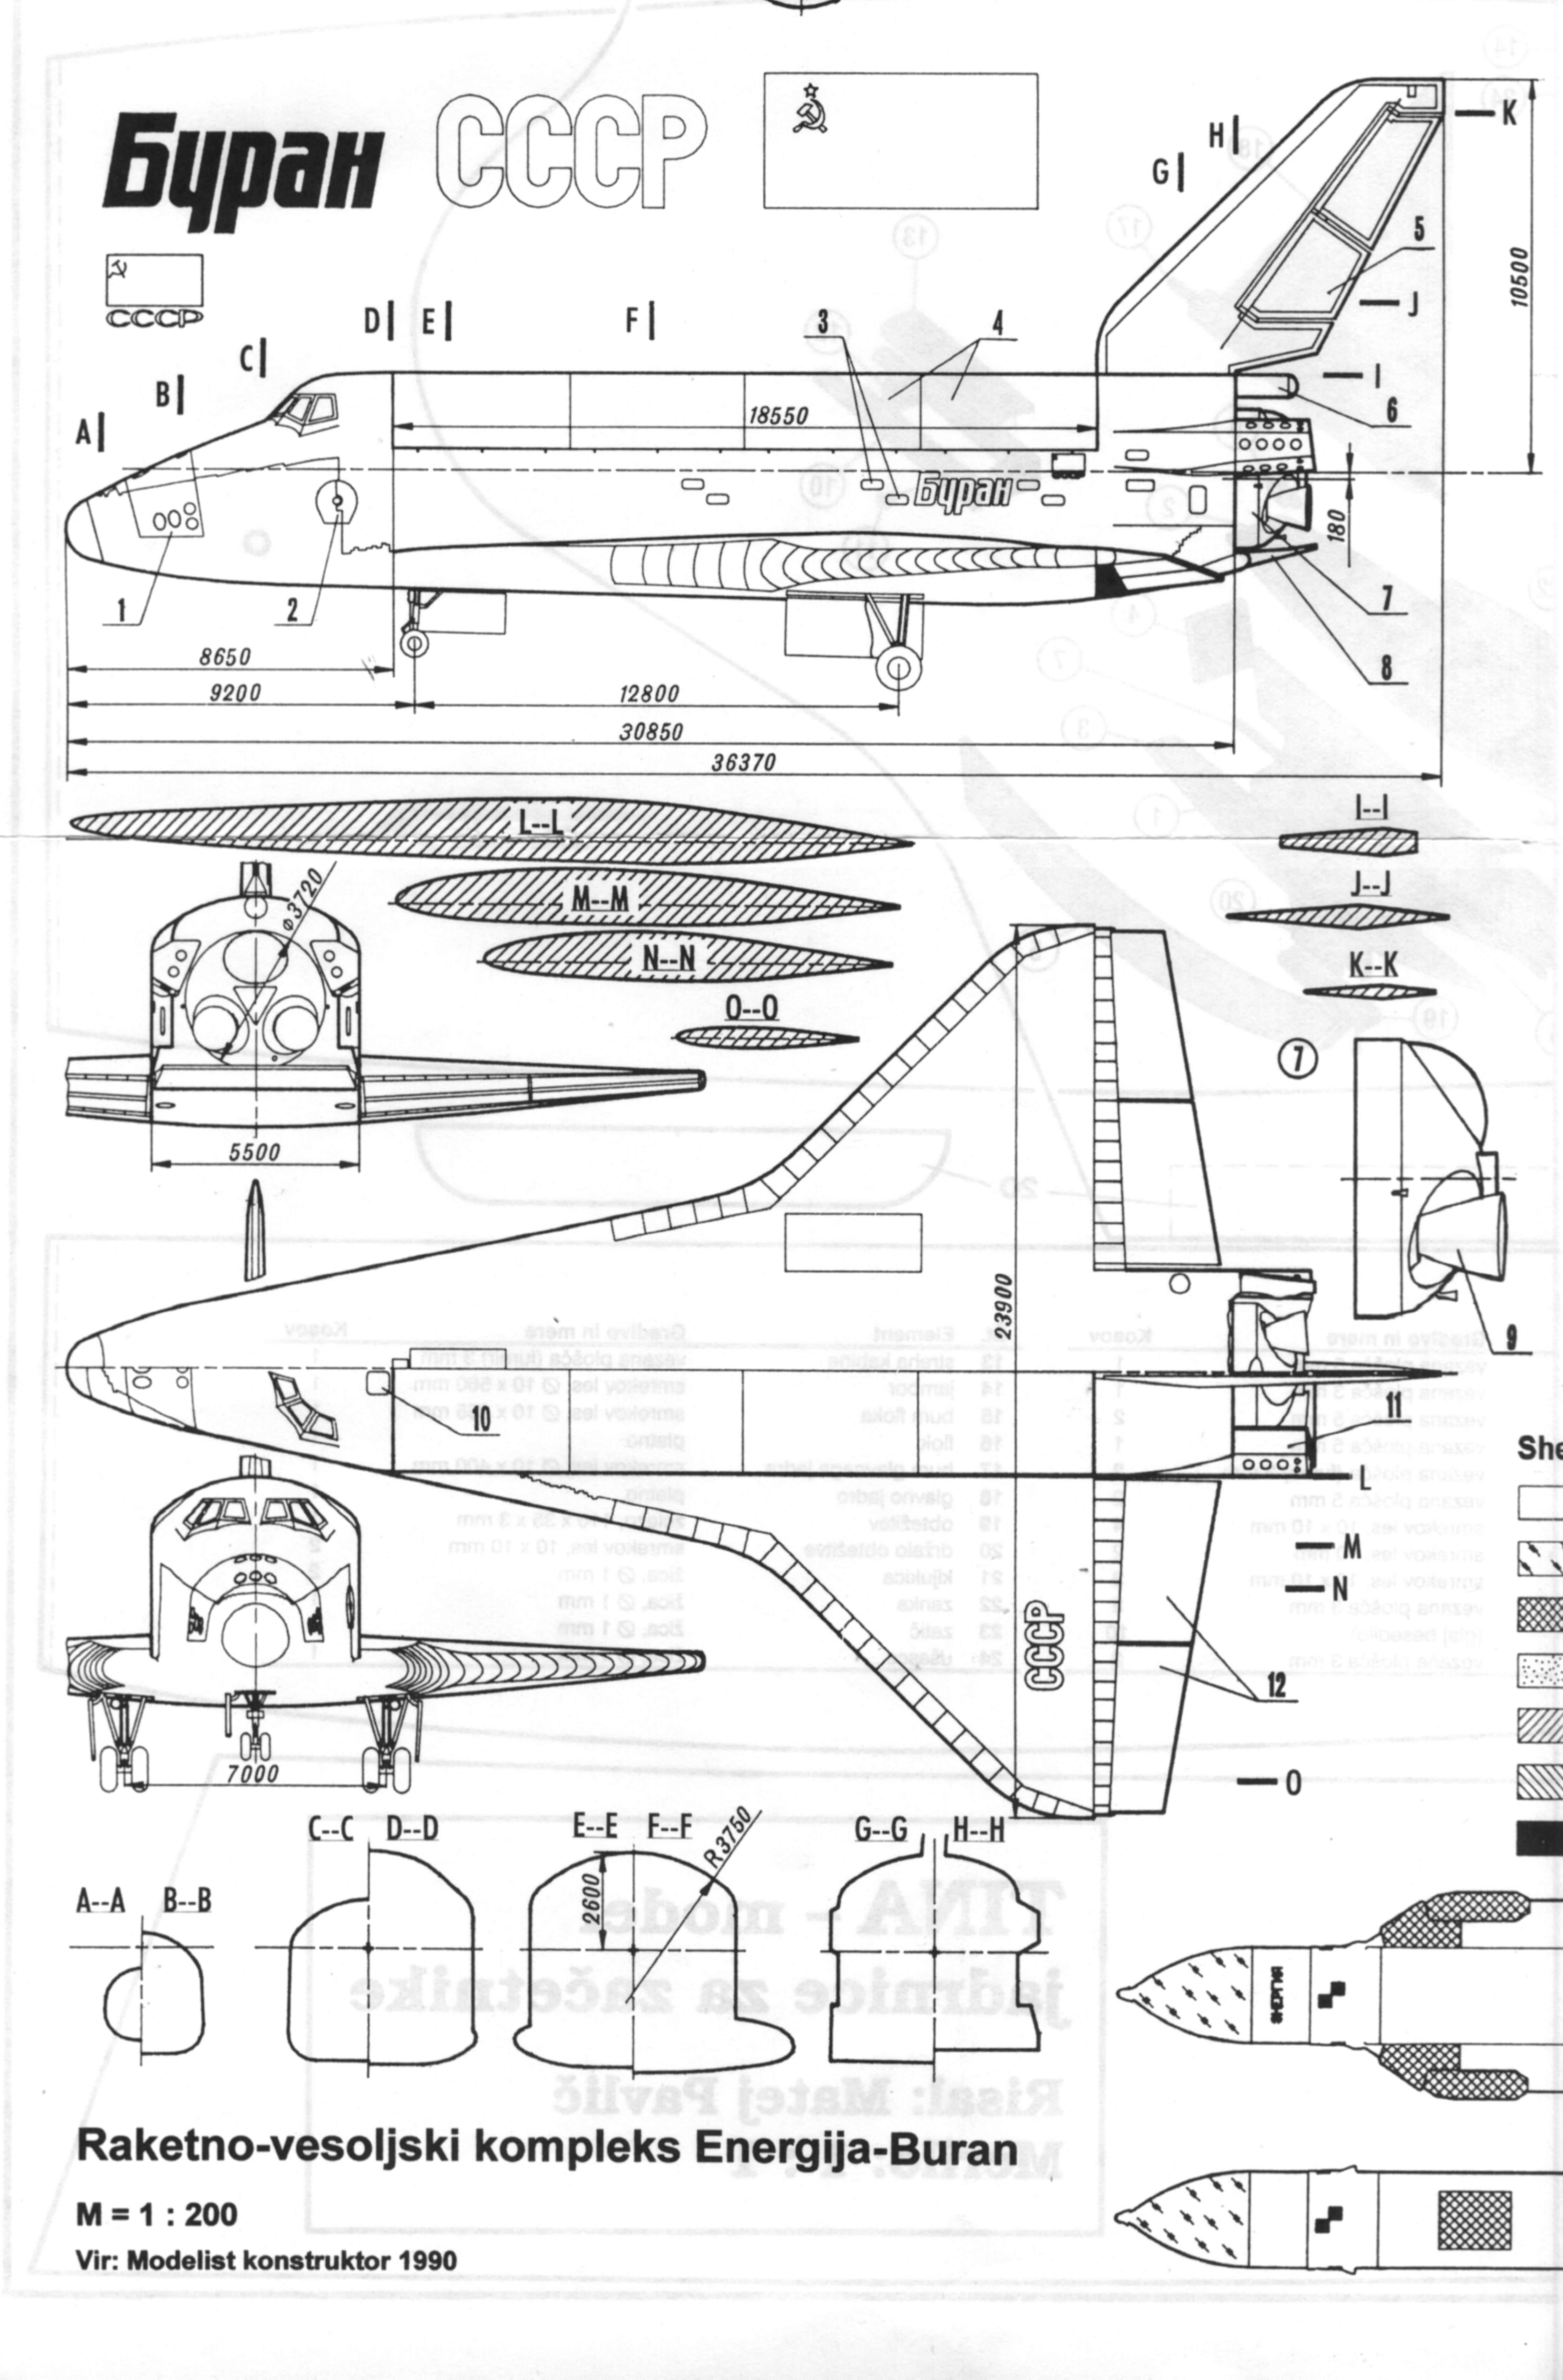 Scale drawings of Russian cosmoplan complex Energia/Buran